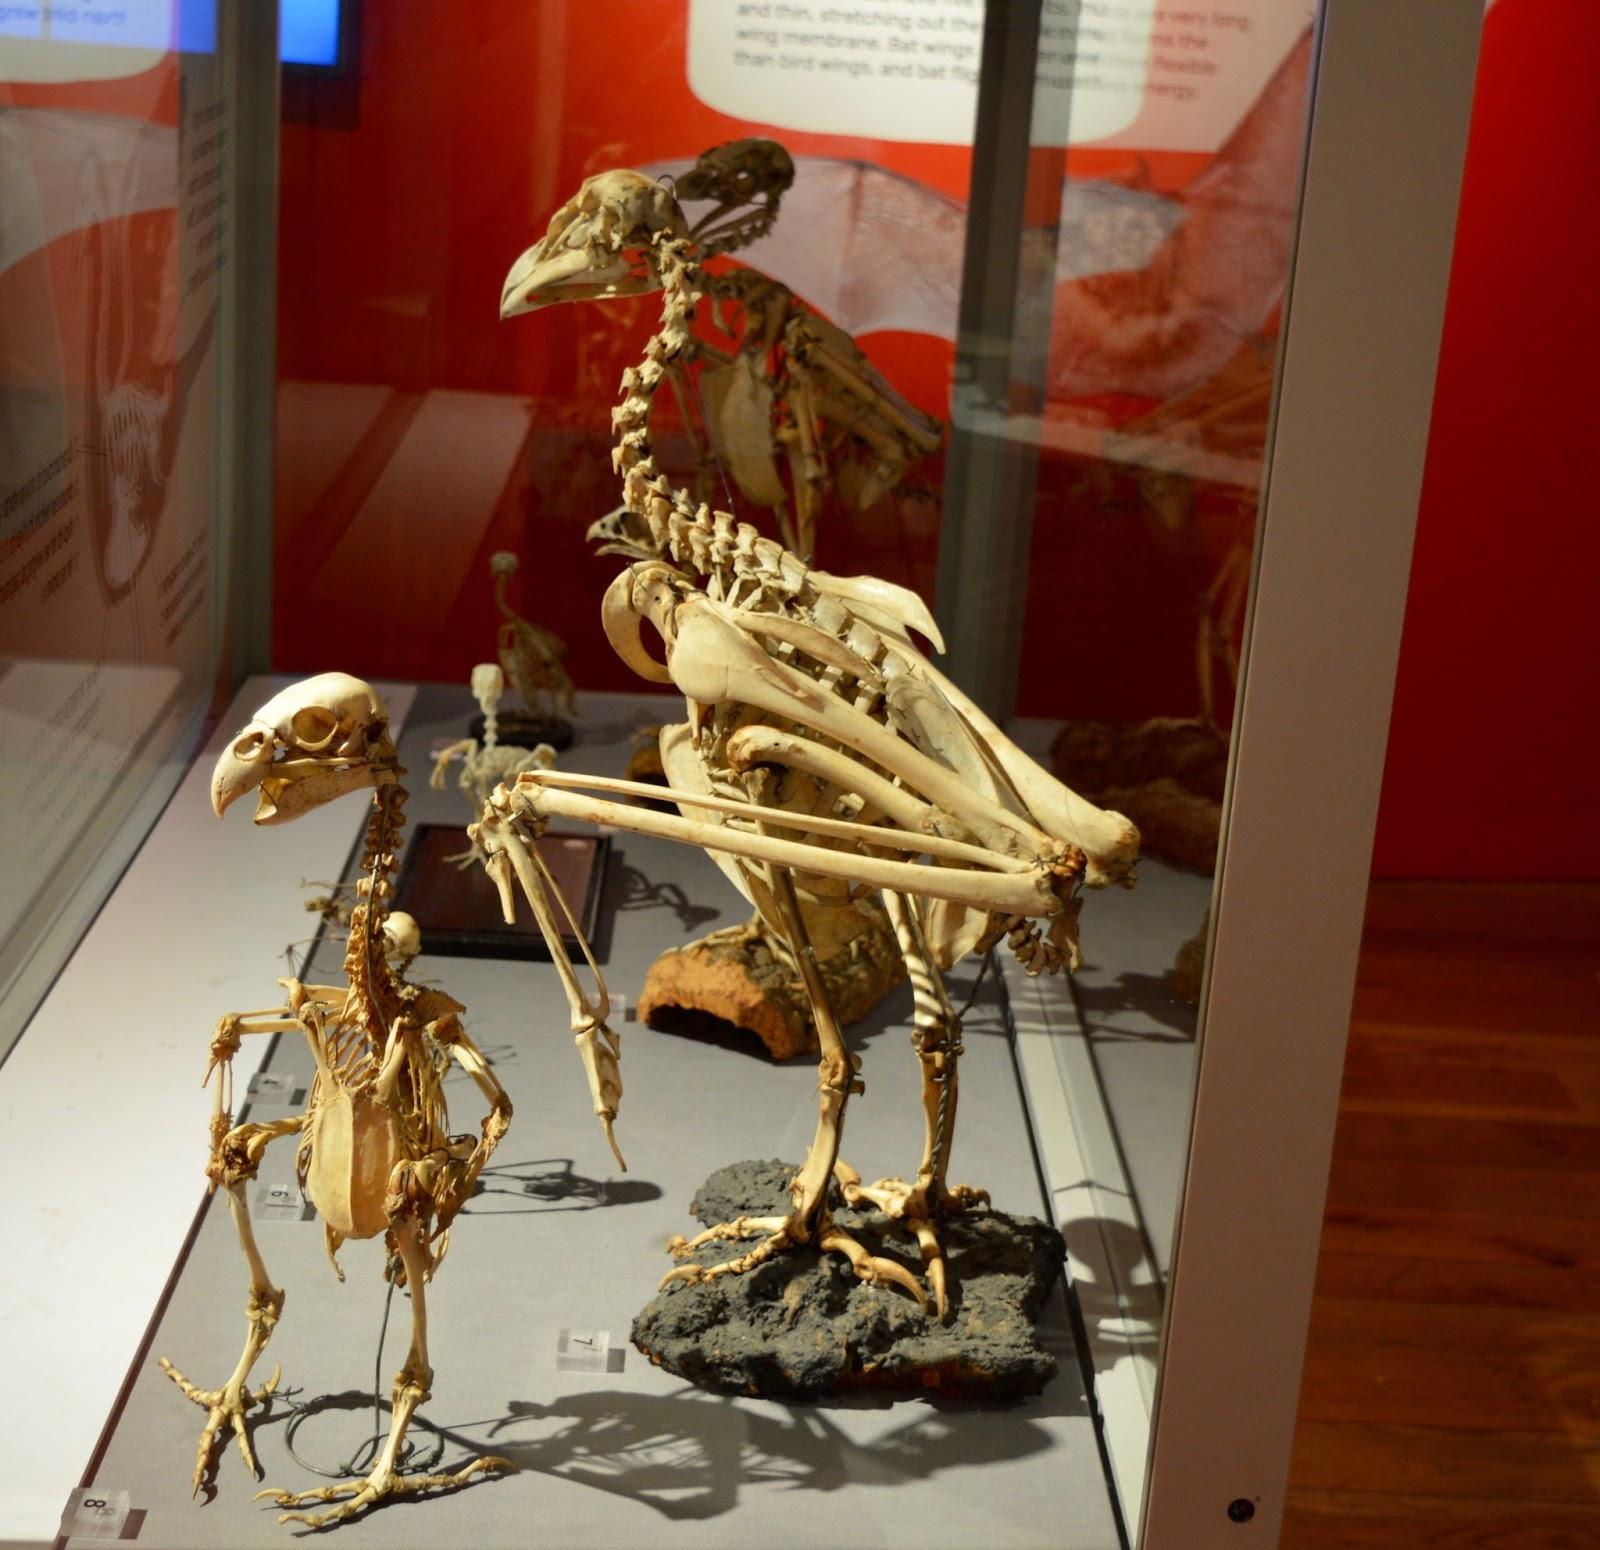 Bones Exhibition at Hancock Museum, Newcastle - bird skeletons